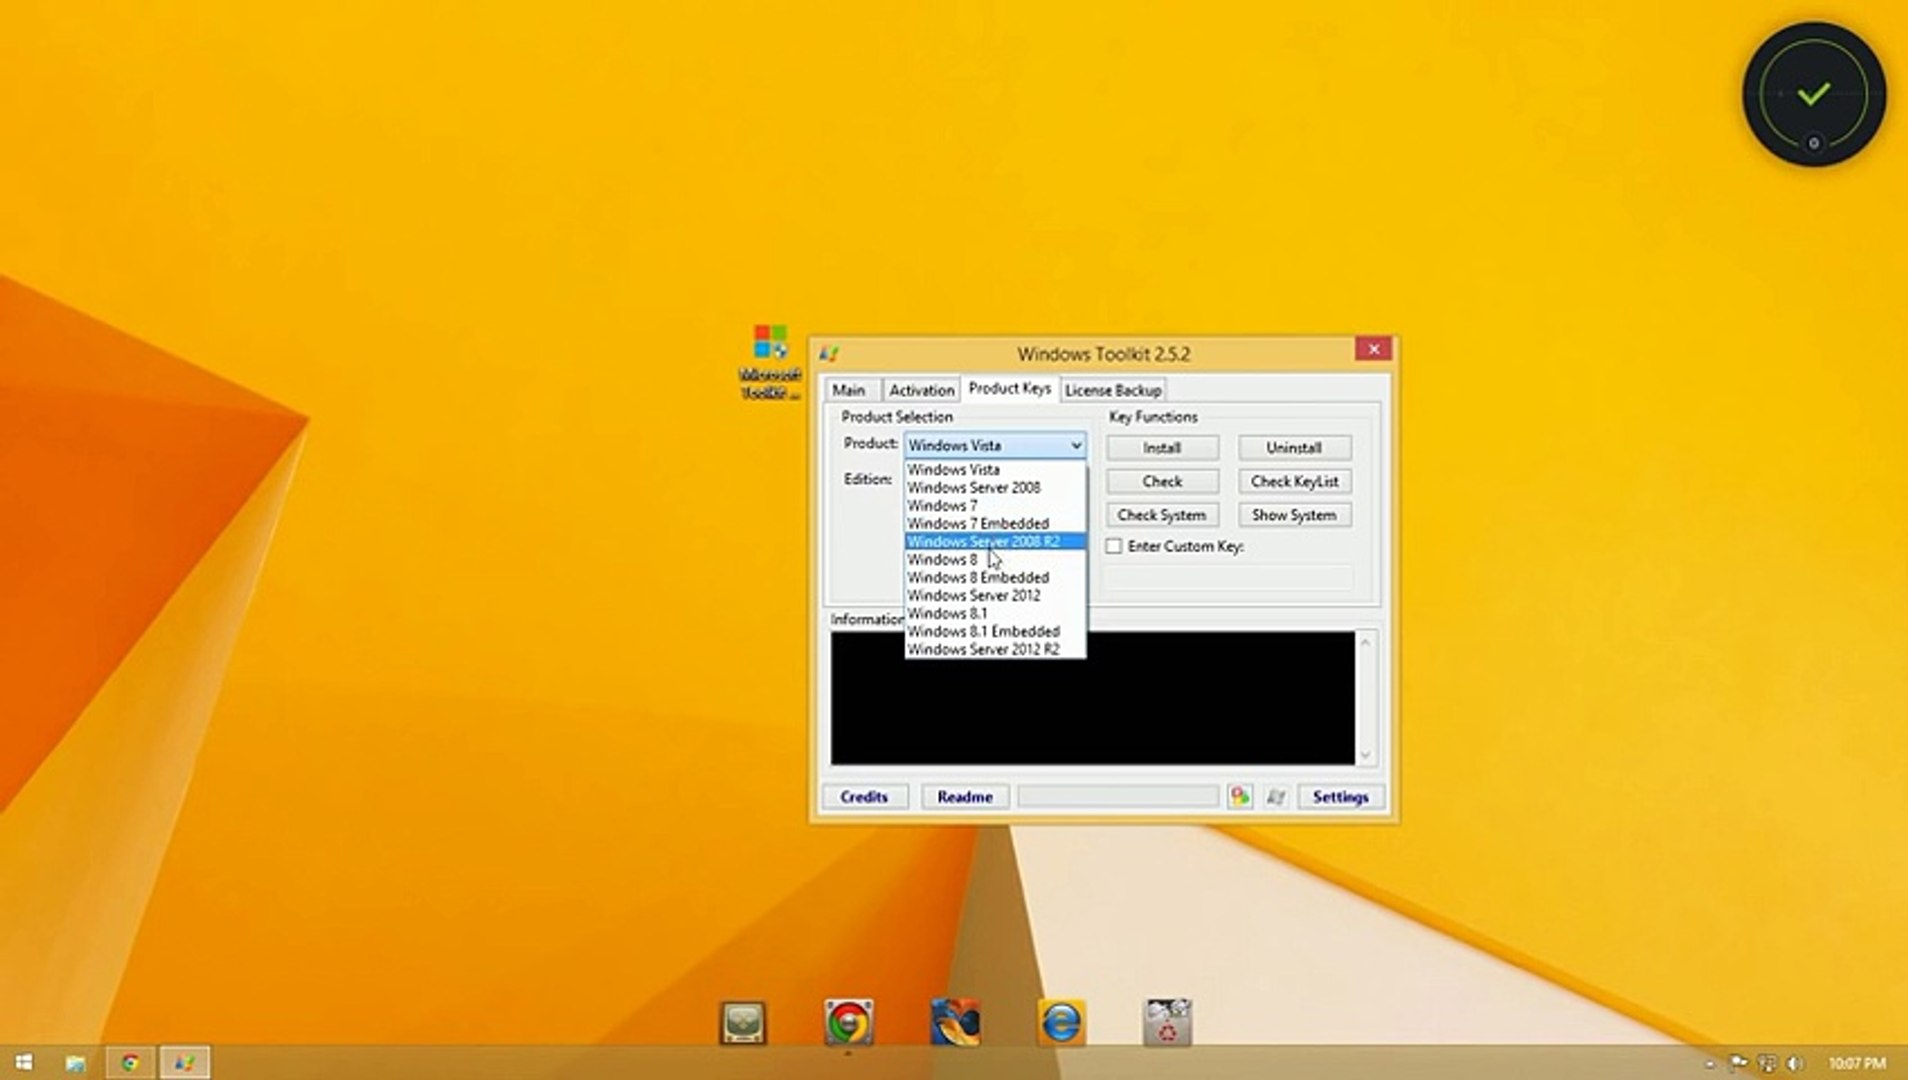 windows 8.1 toolkit 2.5 beta